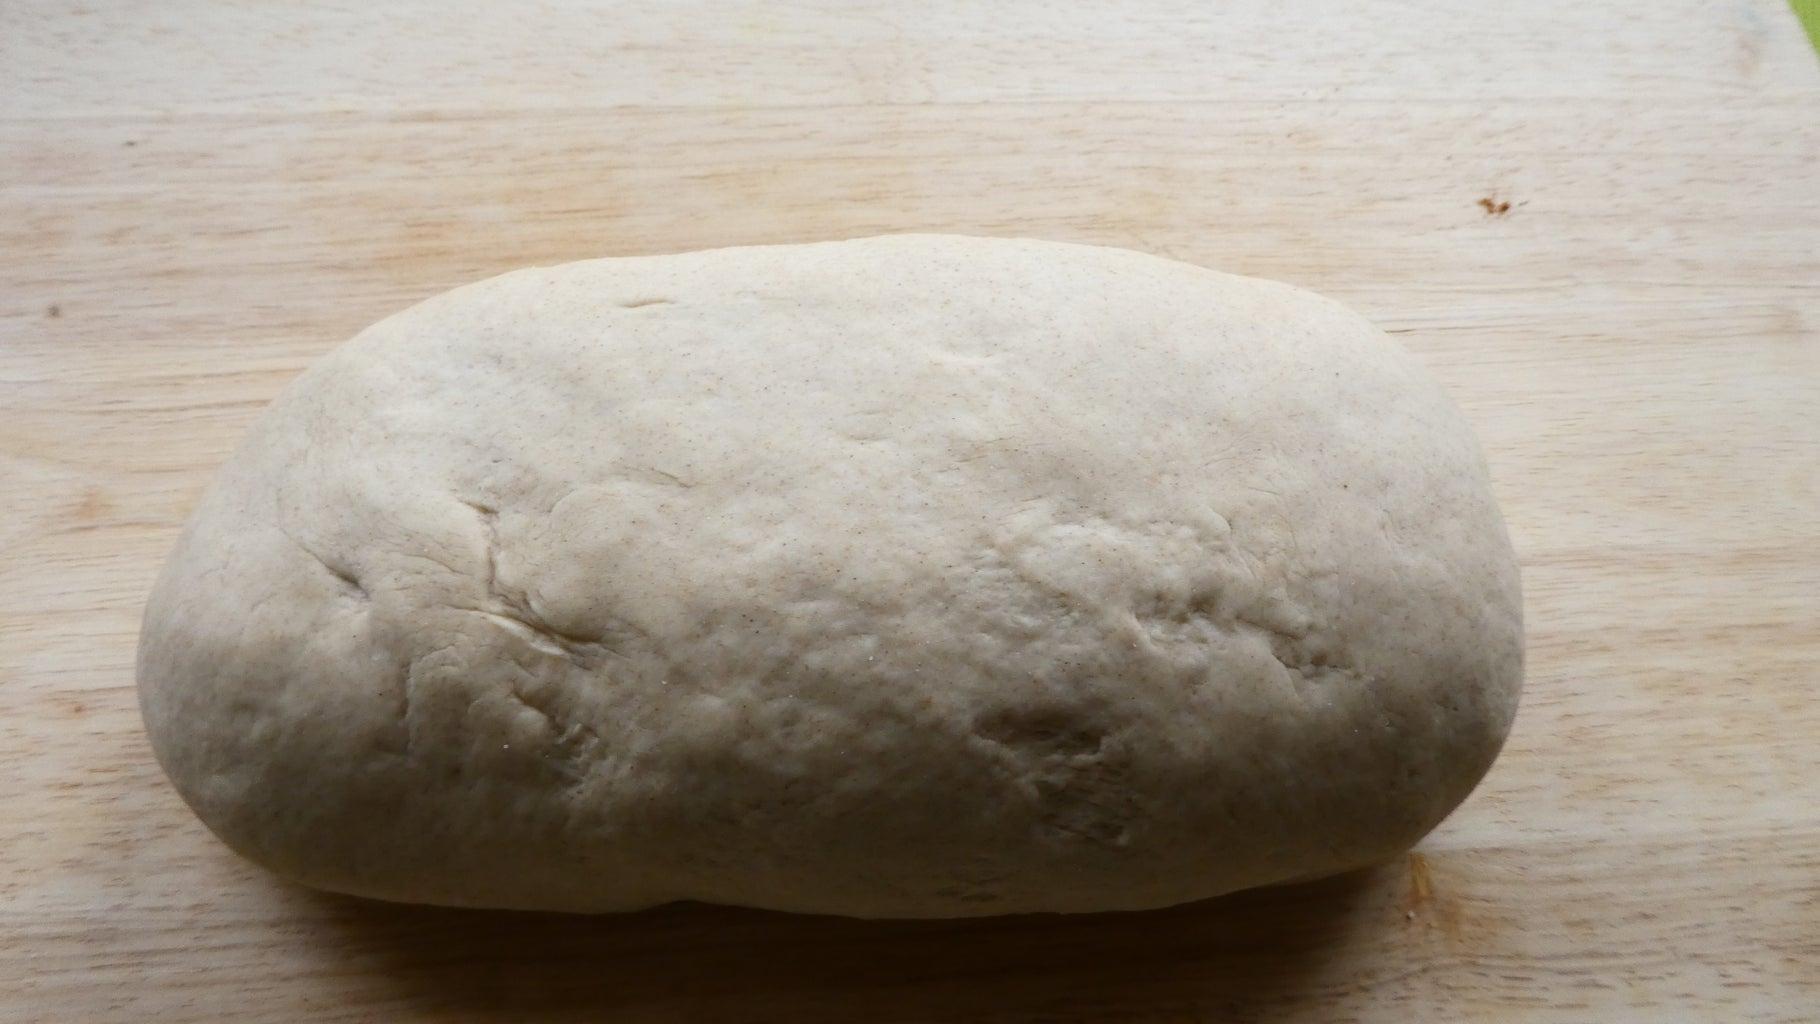 Dividing the Dough: